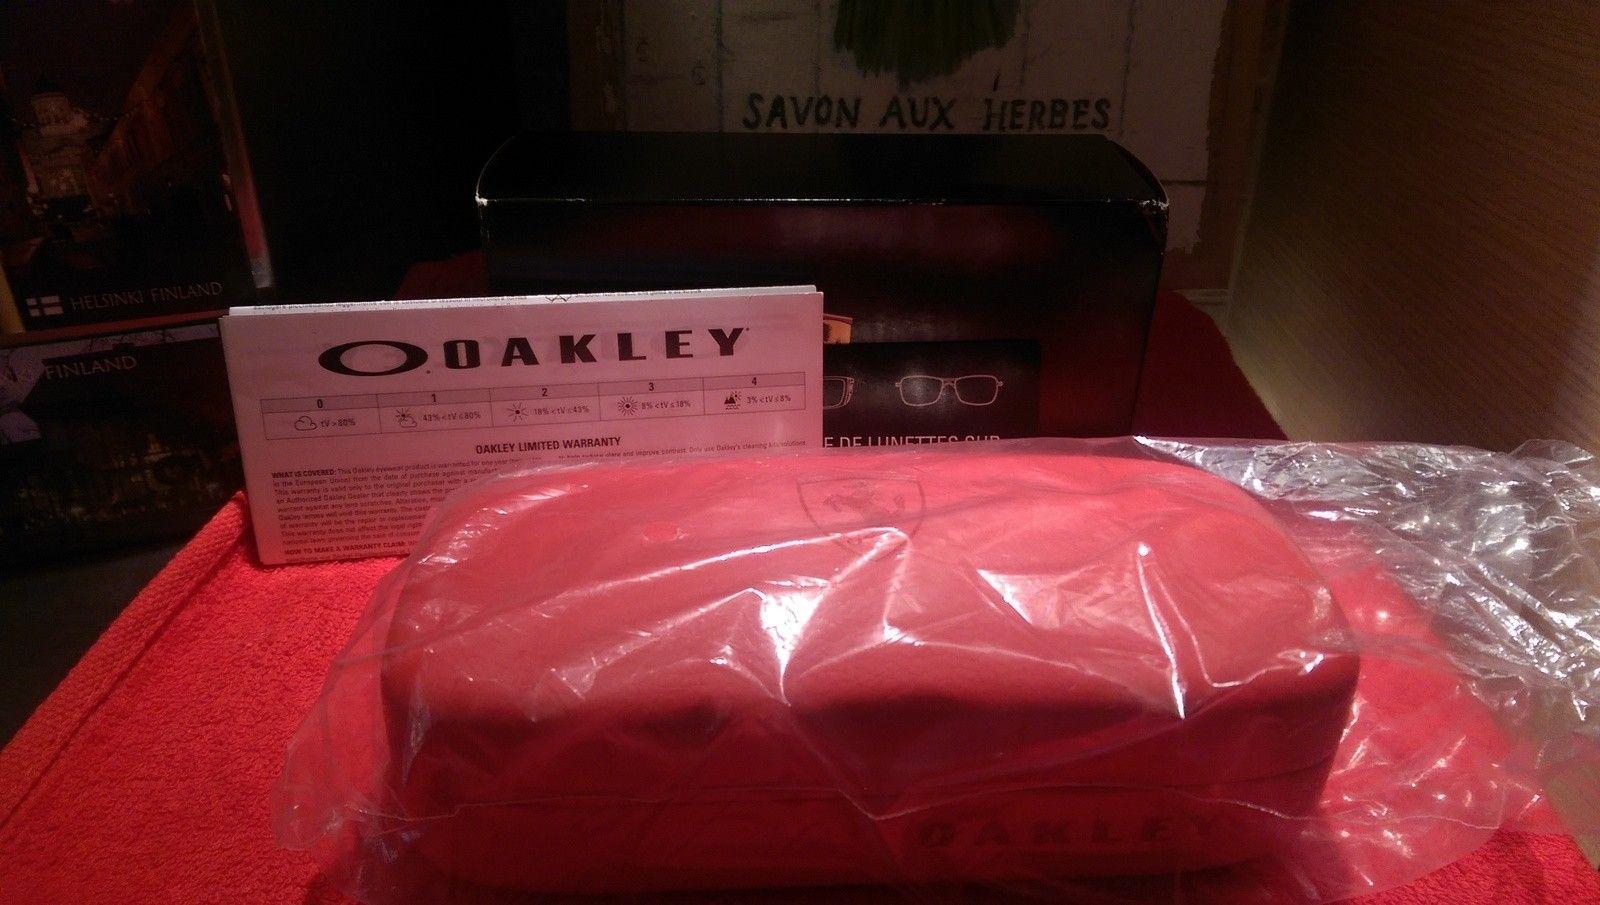 Oakley Scuderia Ferrari Carbon Blade ***Price Drop*** - uploadfromtaptalk1452608029238.jpg